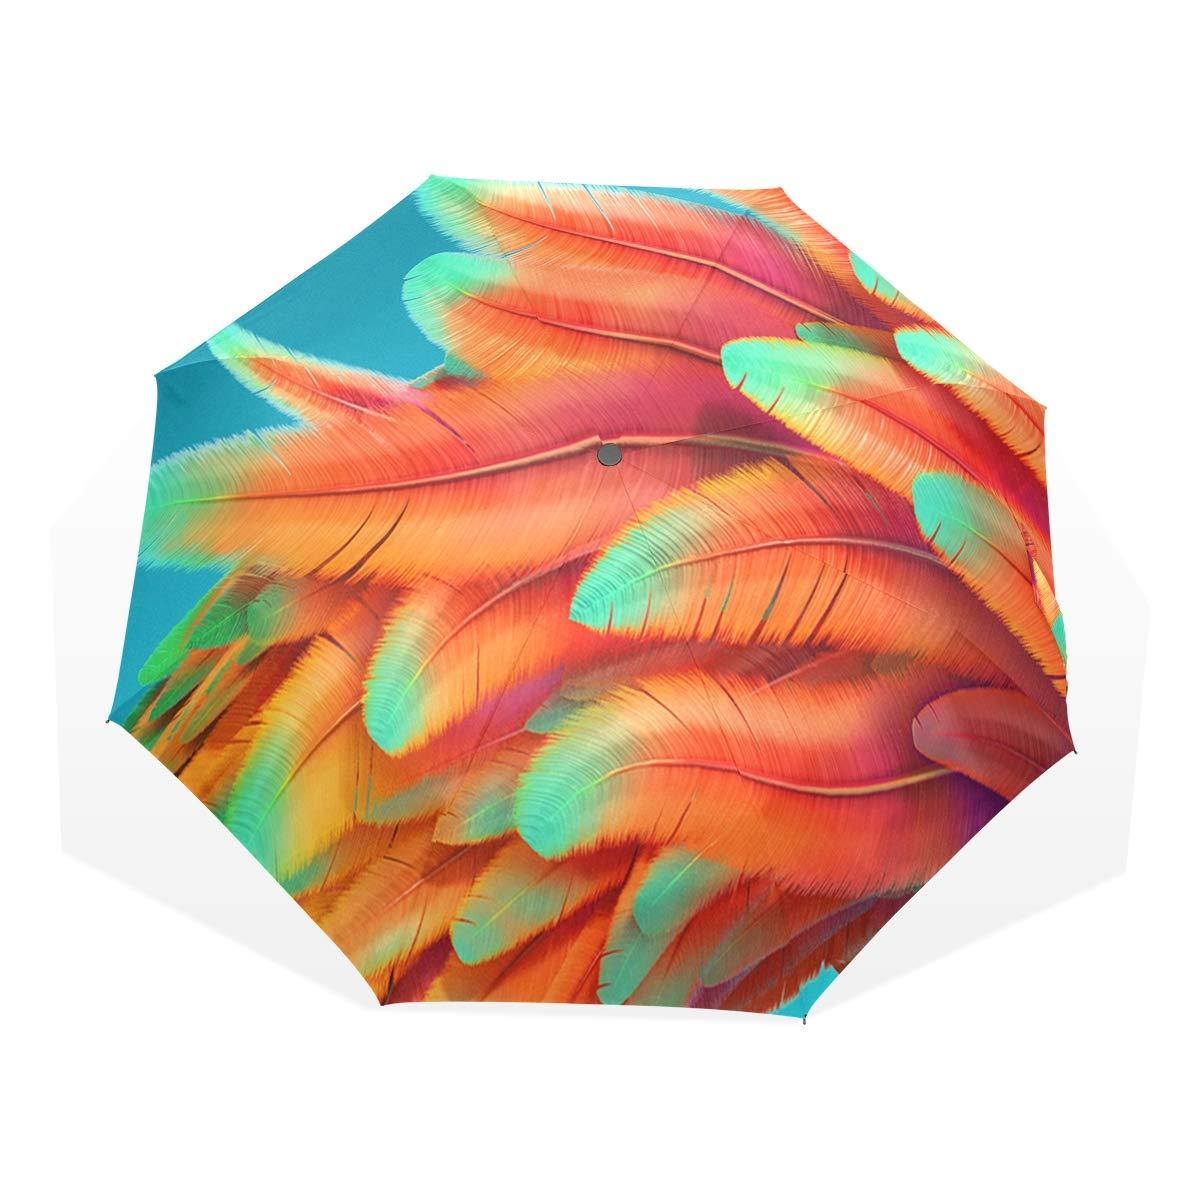 HangWang 傘 ライムグリーン ダイヤモンドパターン 旅行/ゴルフ/日/雨/風に強い傘 UV保護 子供/女の子/男の子用 B07PVMQ4XP パターン4 37.8\